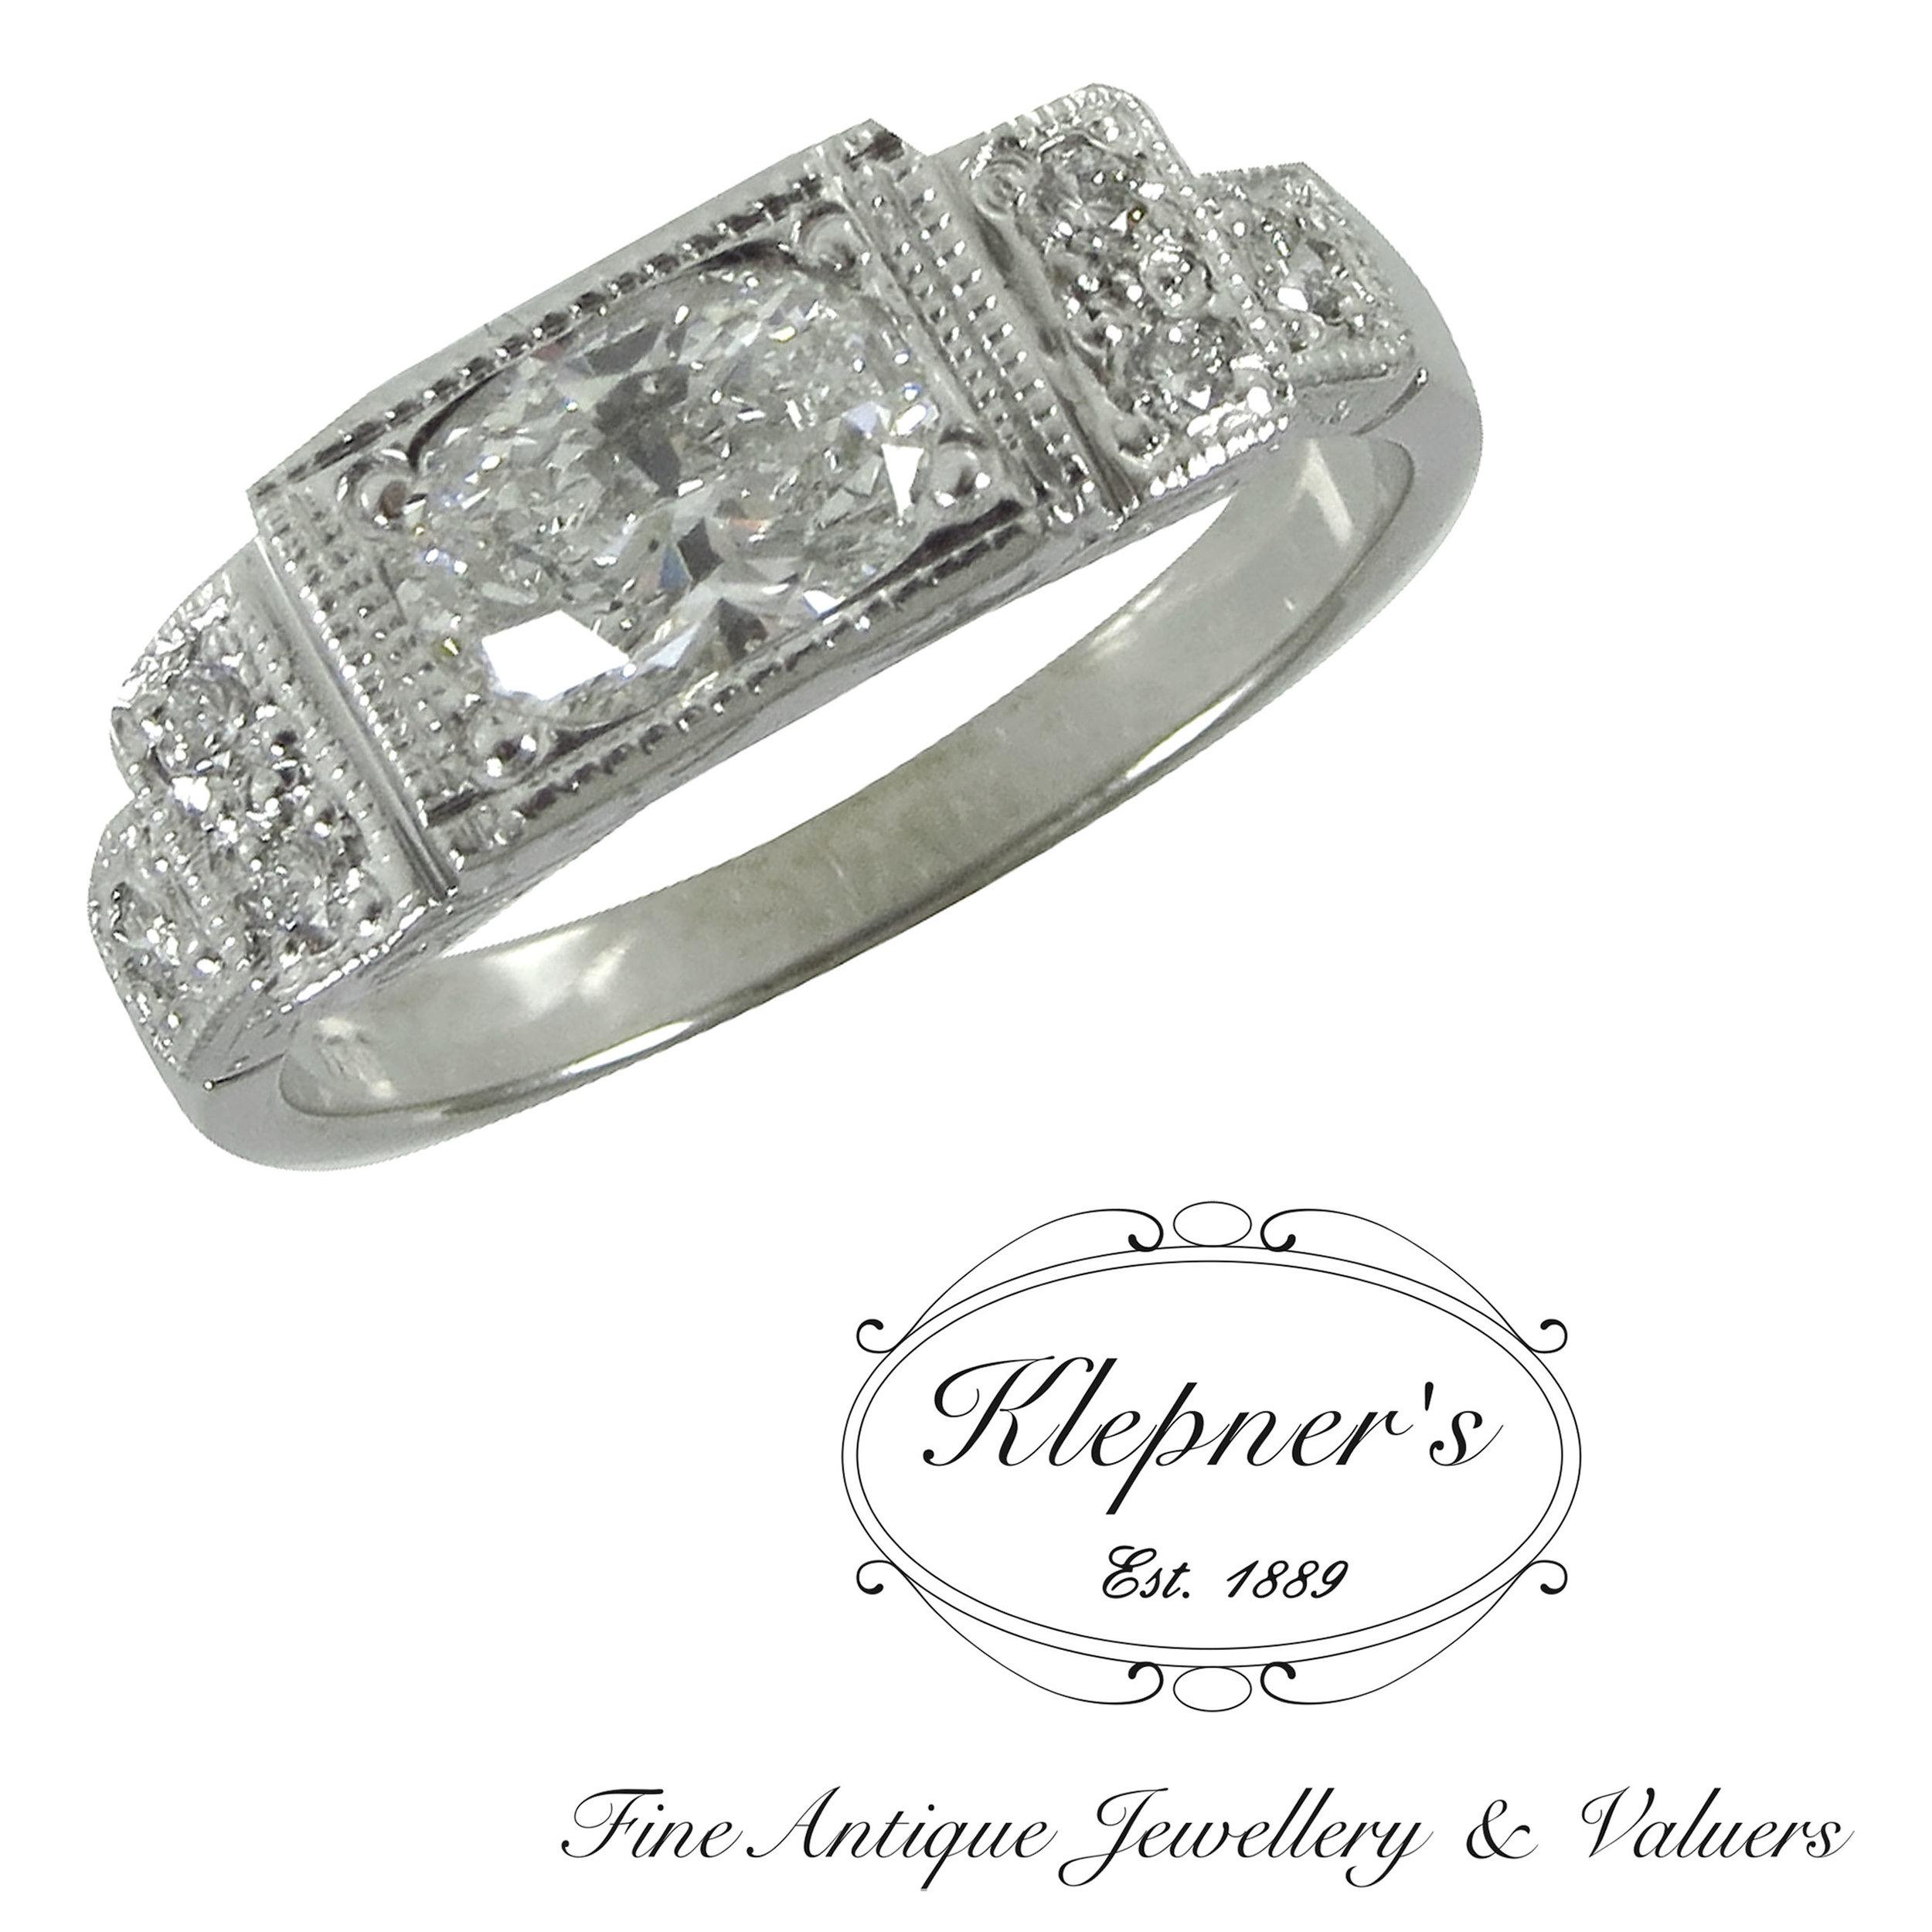 Art Deco inspired 18ct white gold diamond engagement ring.